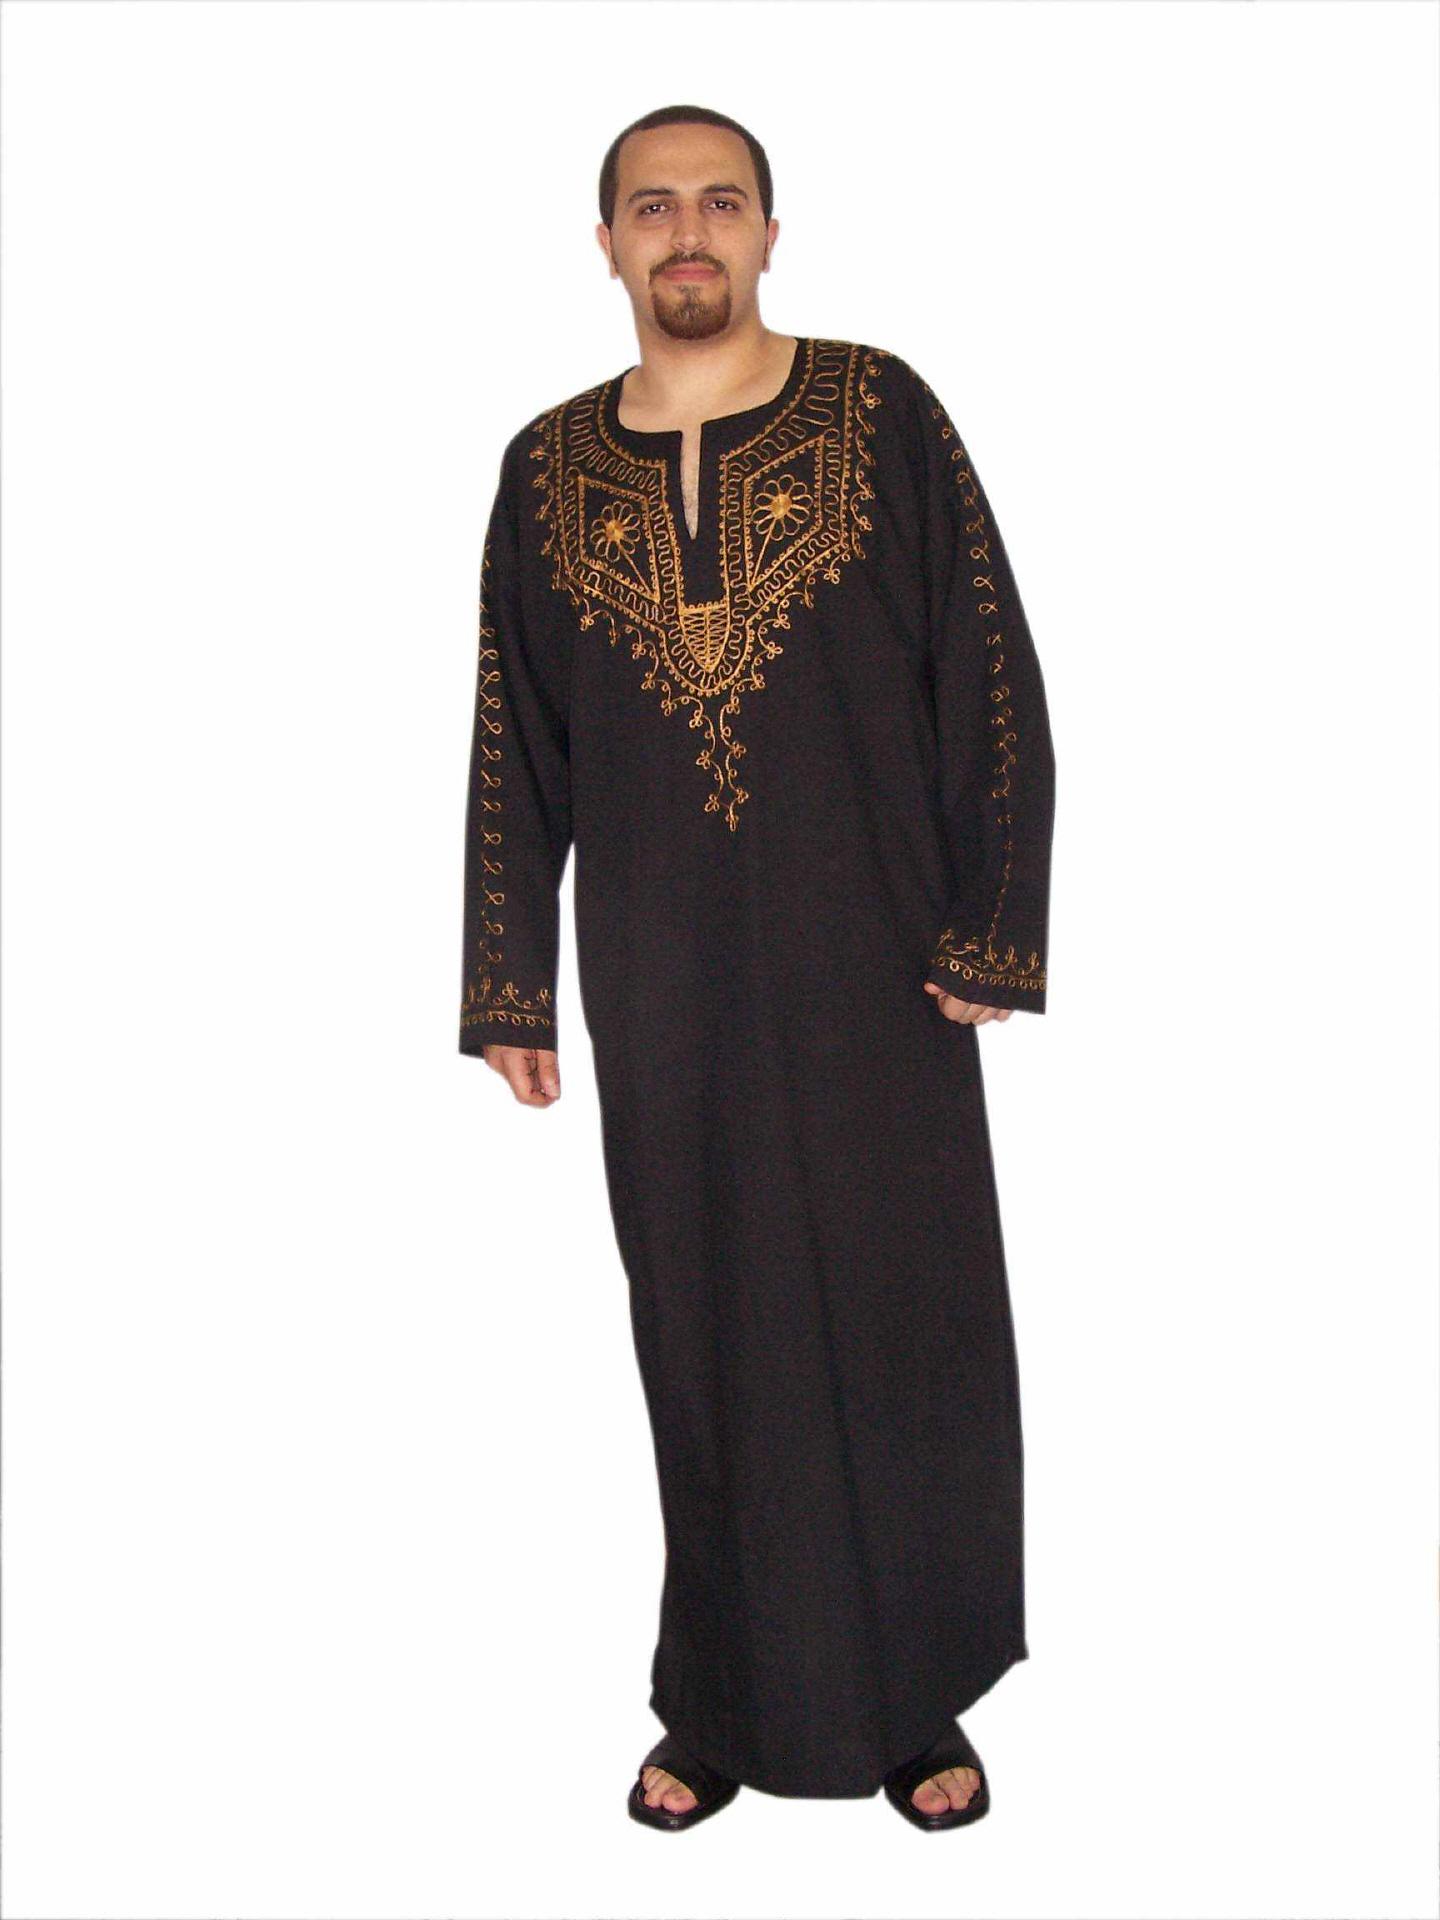 herren kaftan arabische herren-kleider- egypt bazar onlineshop